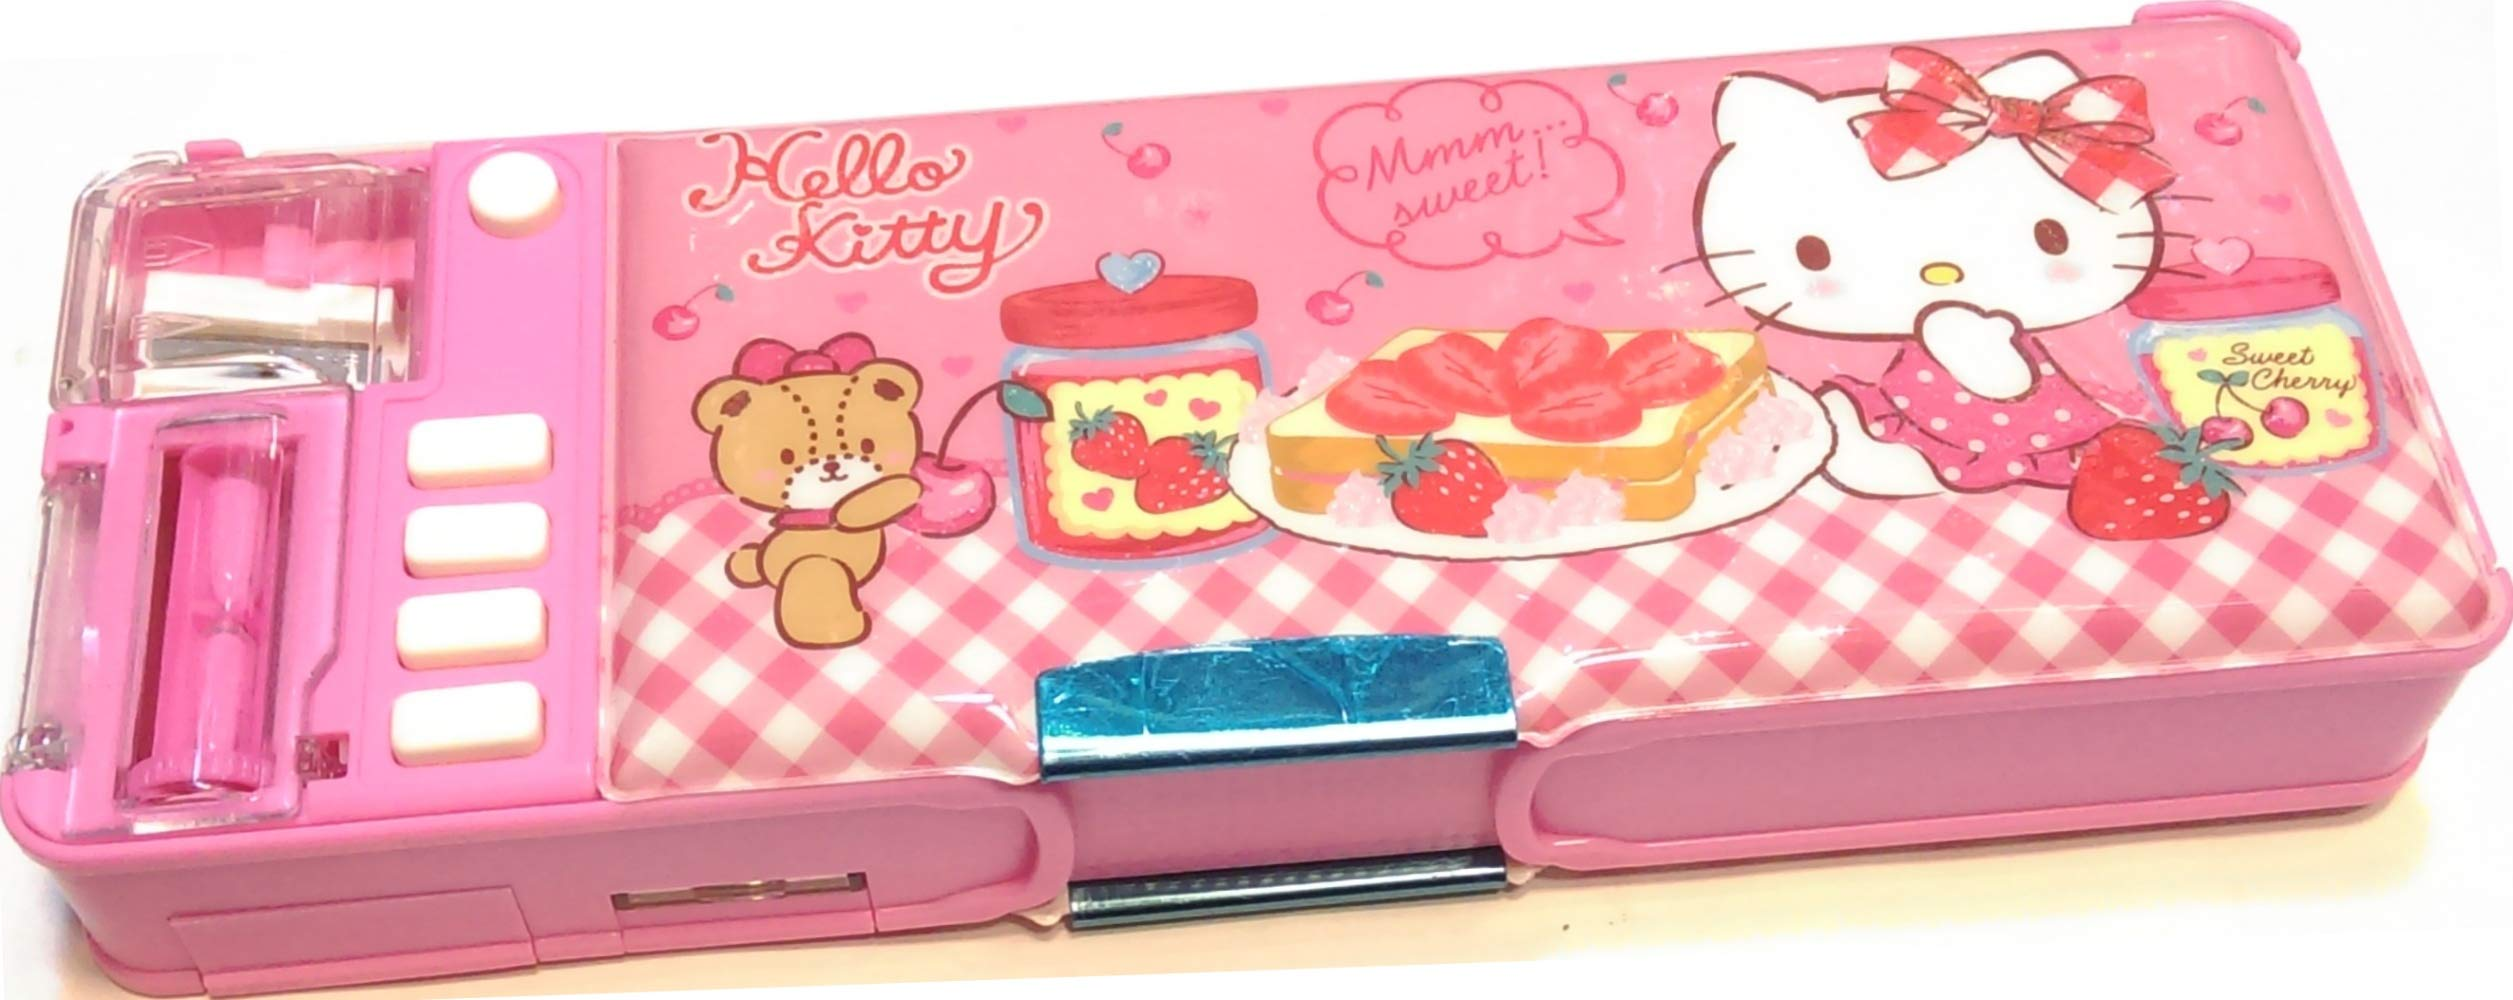 Hello Kitty Glitter Glue Multi Functional 2-Sided Holder Pencil Pen Box Deluxe Case w/Sharpener Timetable by Ellon